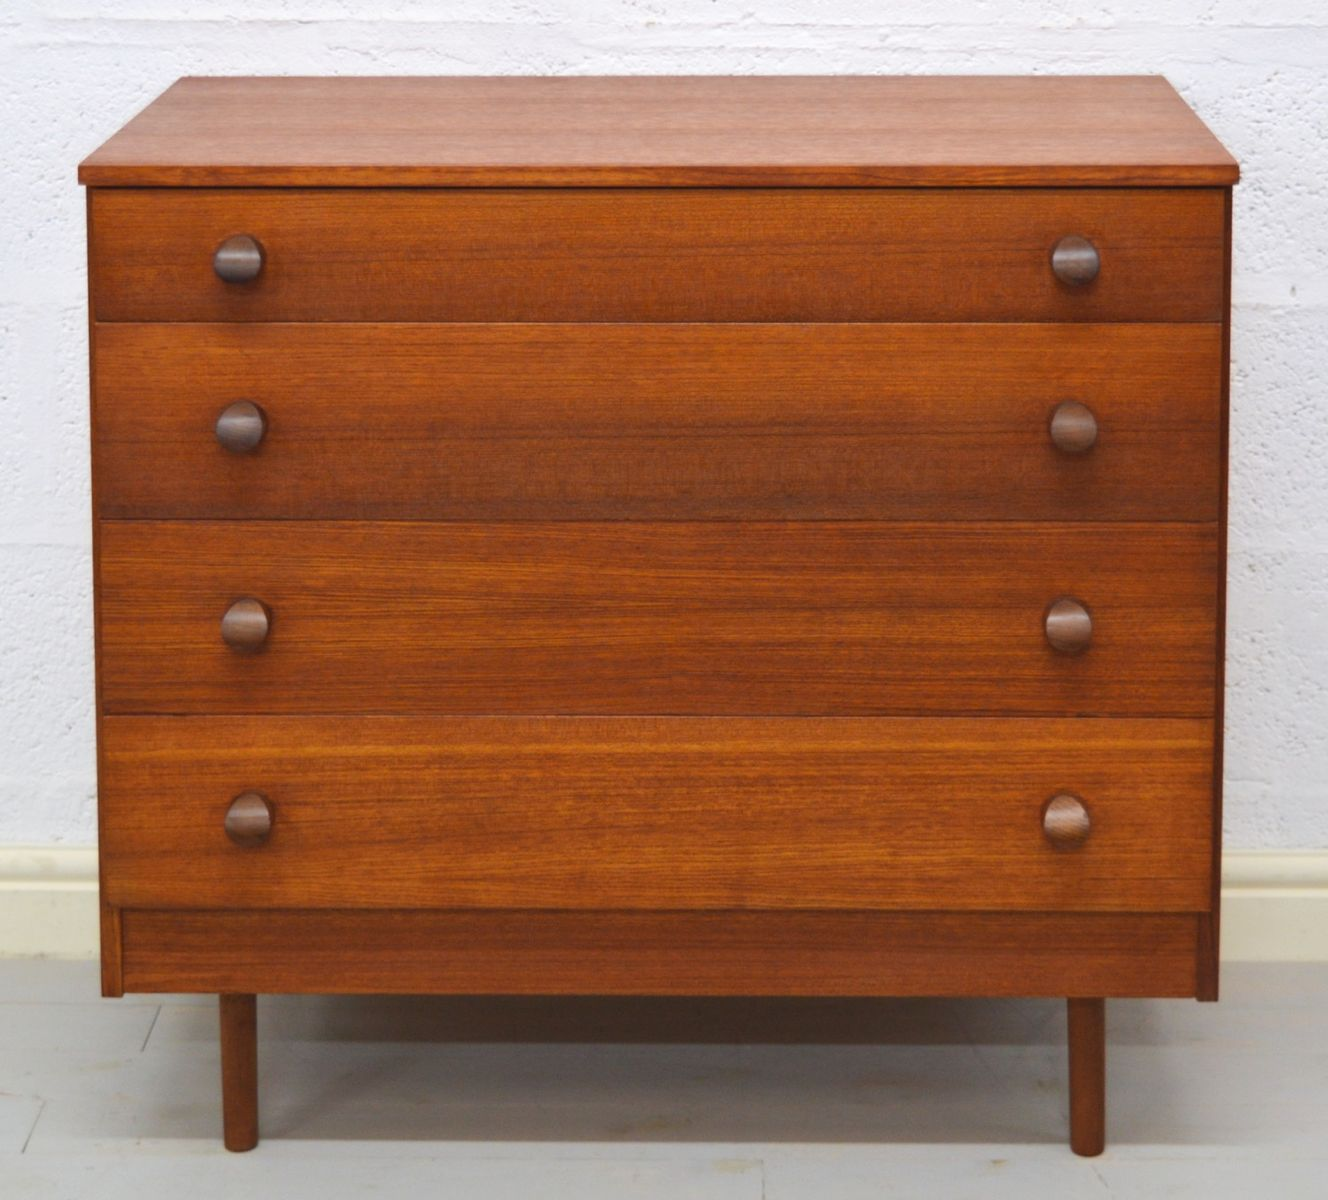 hohe mid century teak kommode von avalon bei pamono kaufen. Black Bedroom Furniture Sets. Home Design Ideas